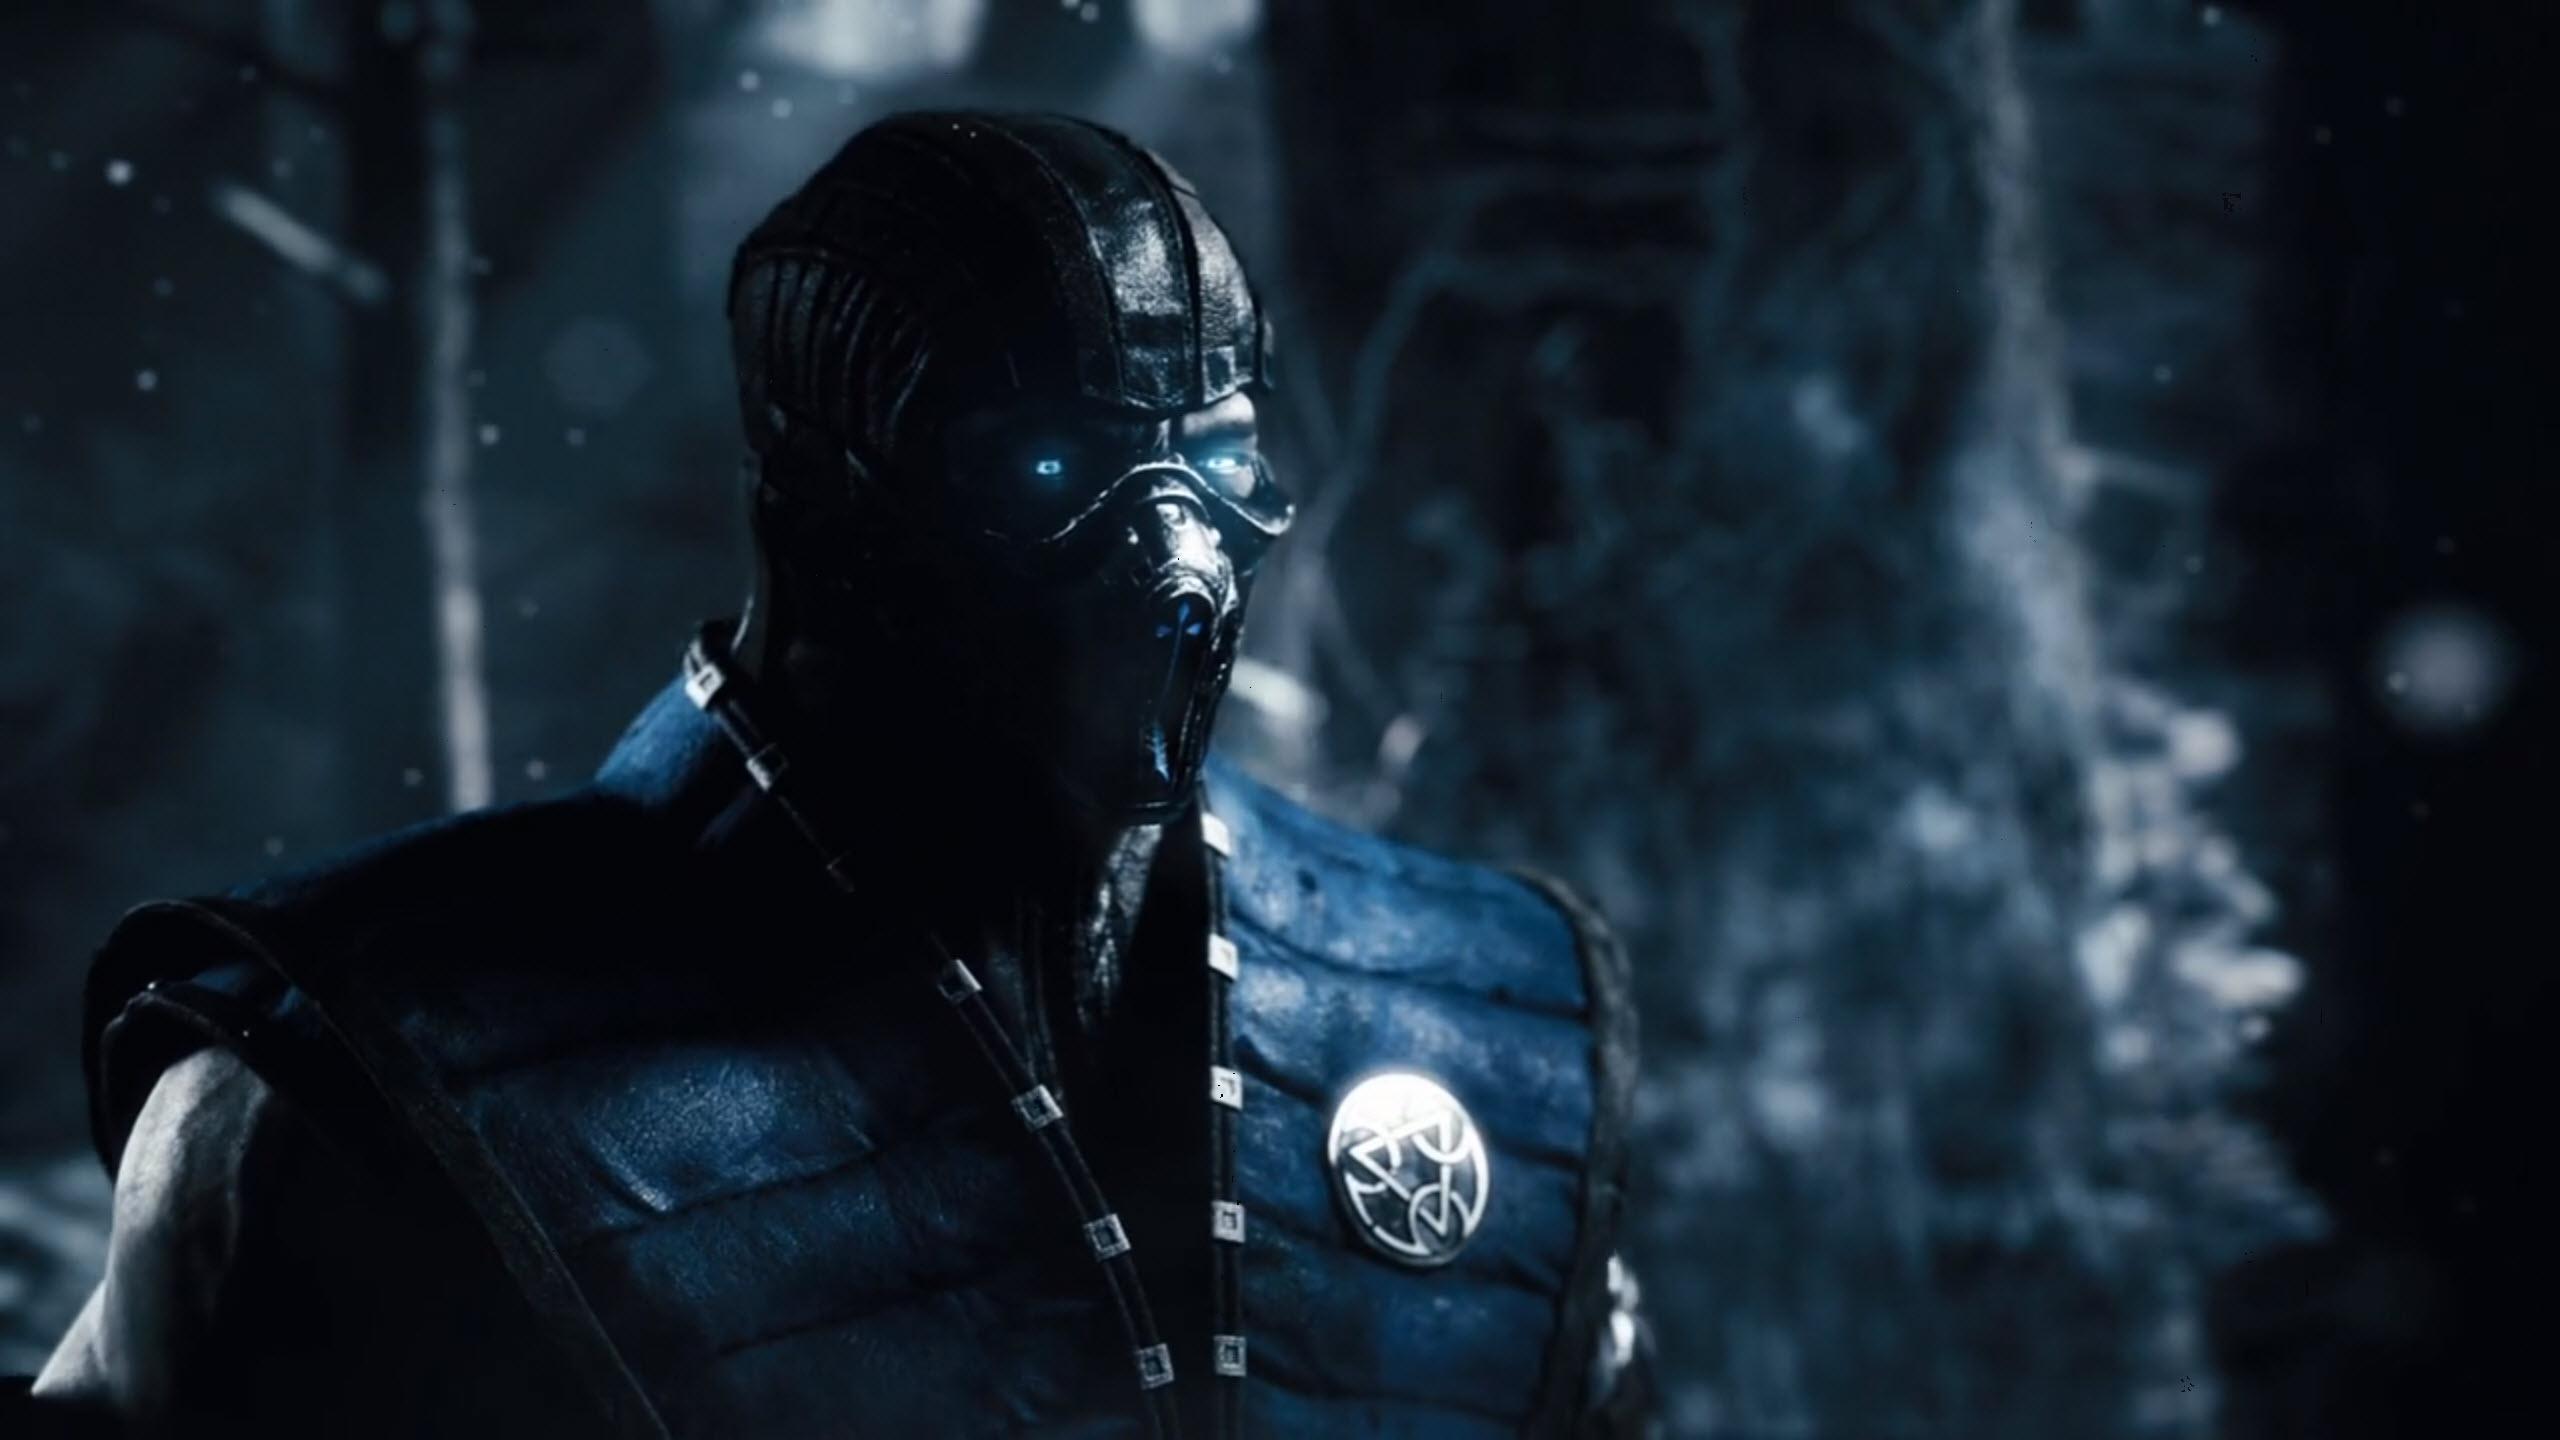 Mortal Kombat X Fatality Lives On Features Multiplatform Support